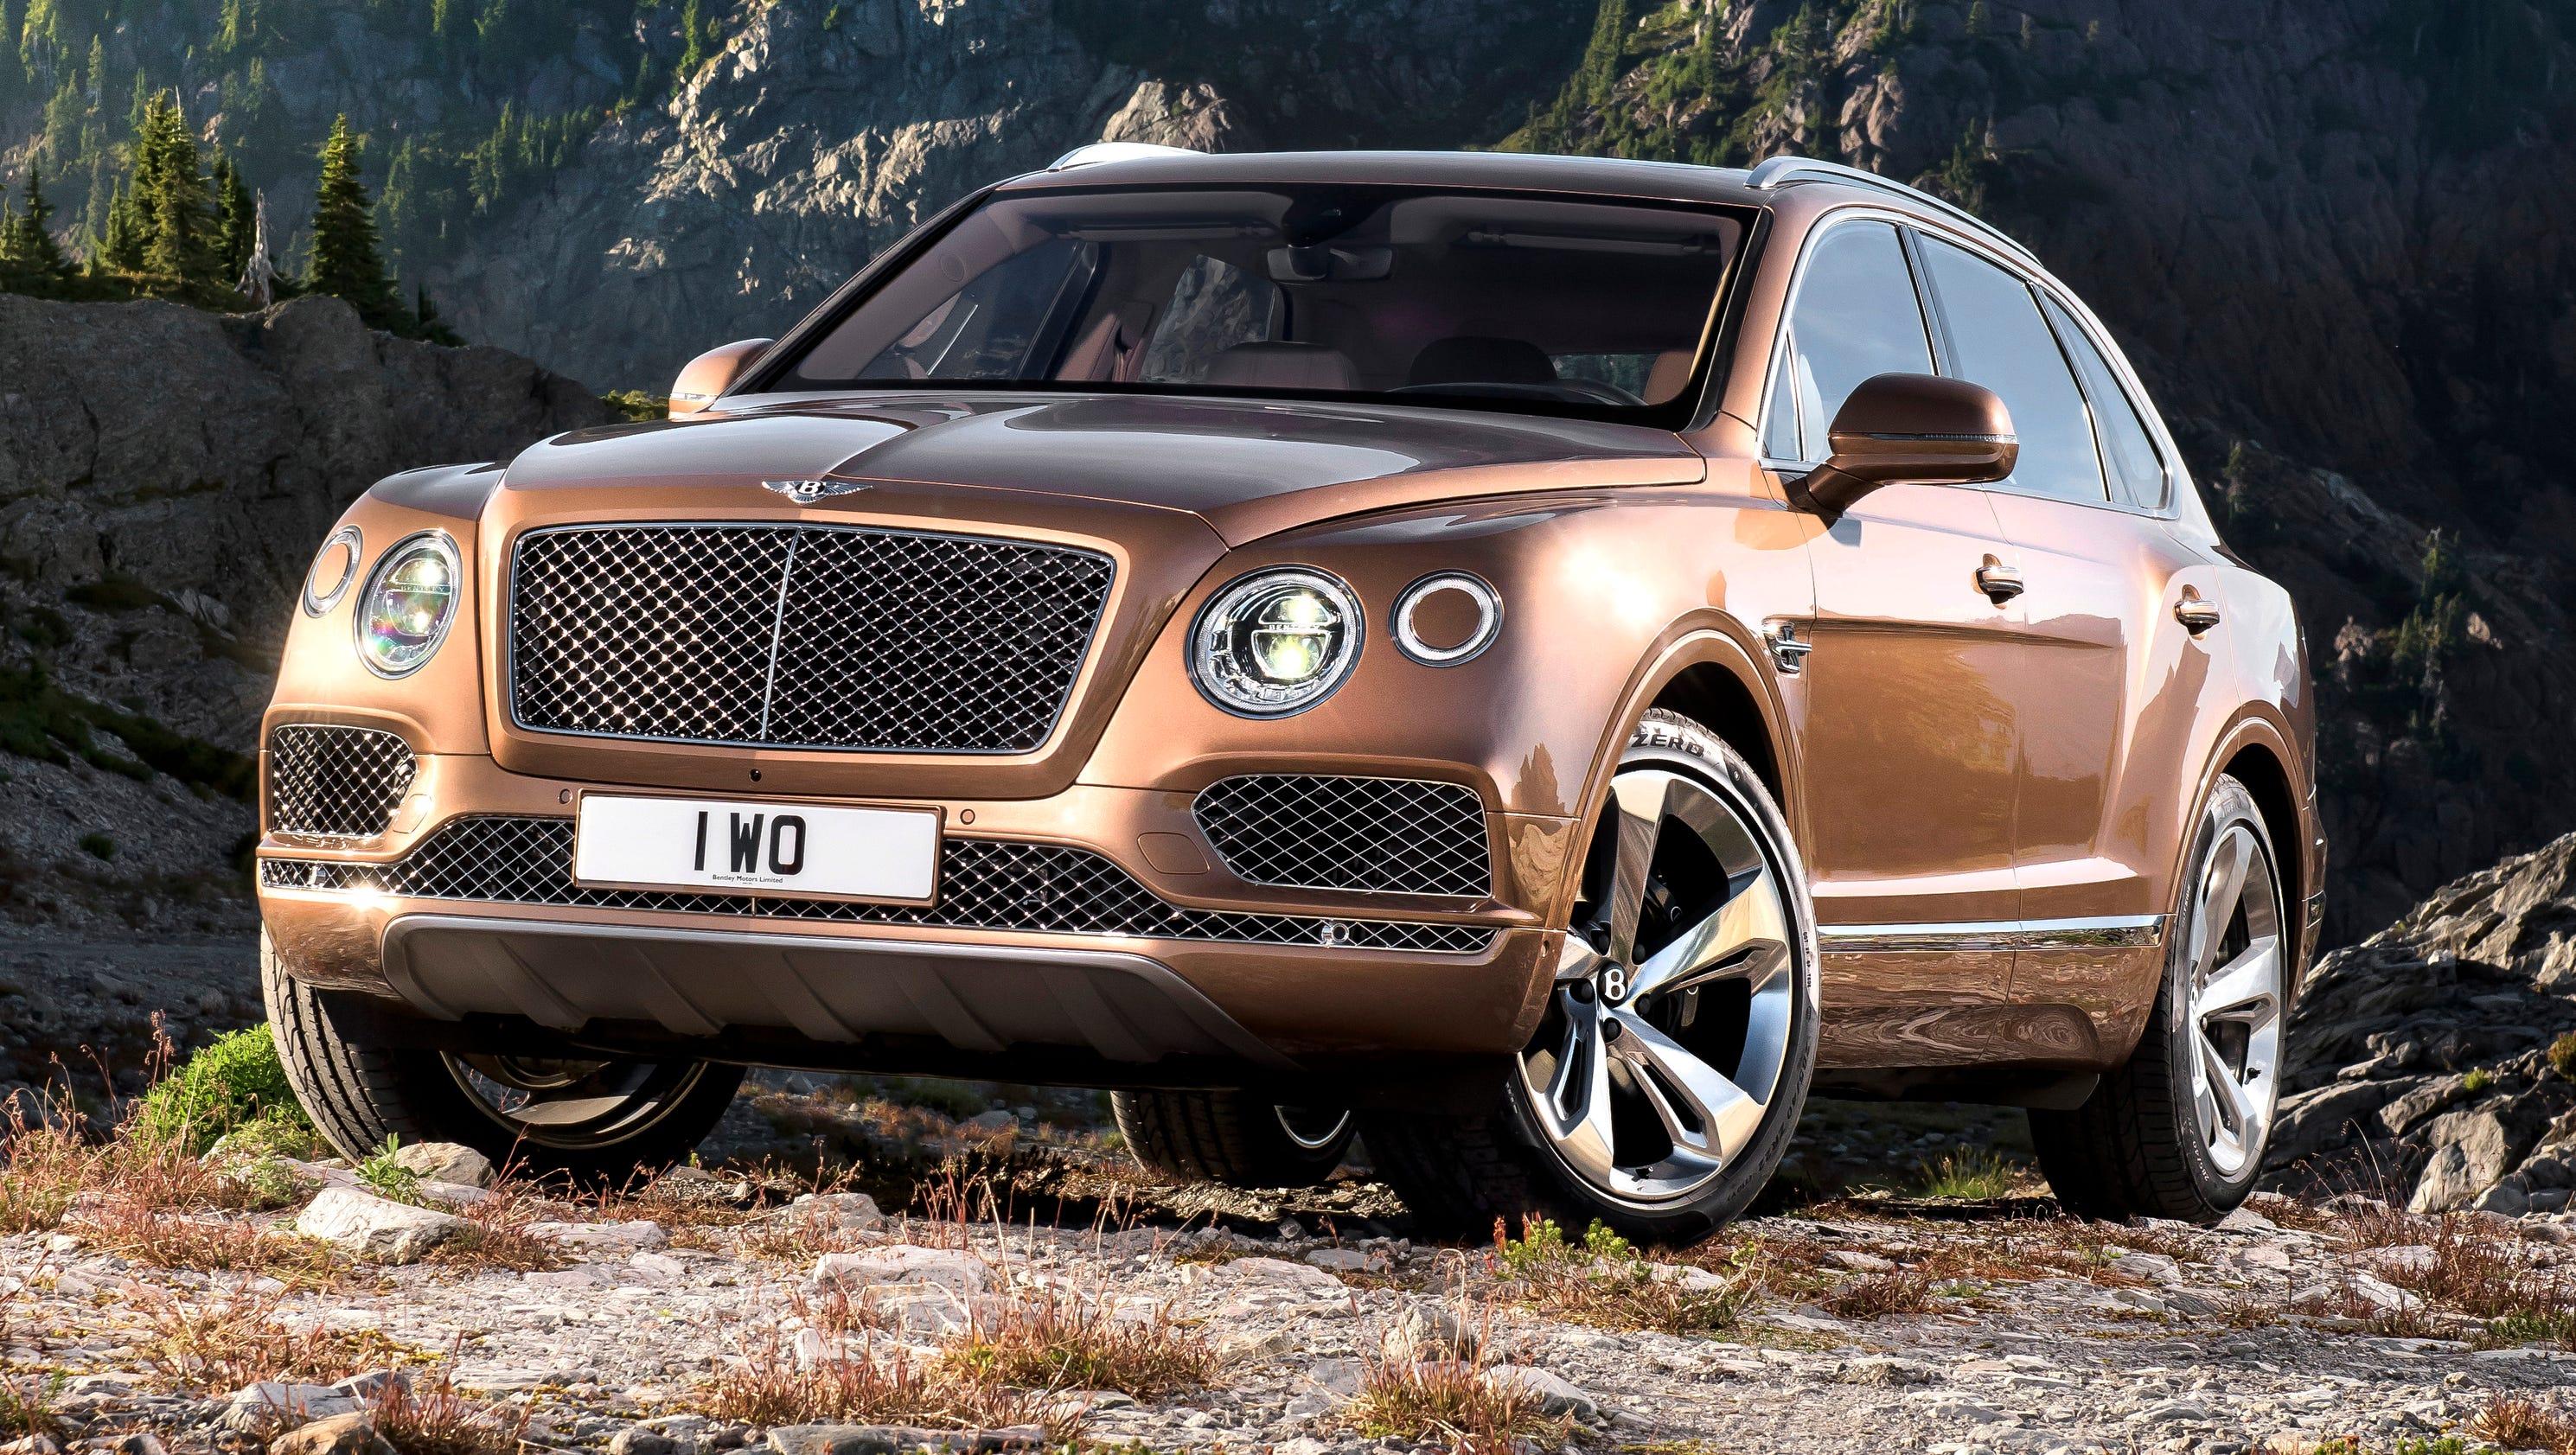 Bentley Prices Bentayga Suv Way Above 200k